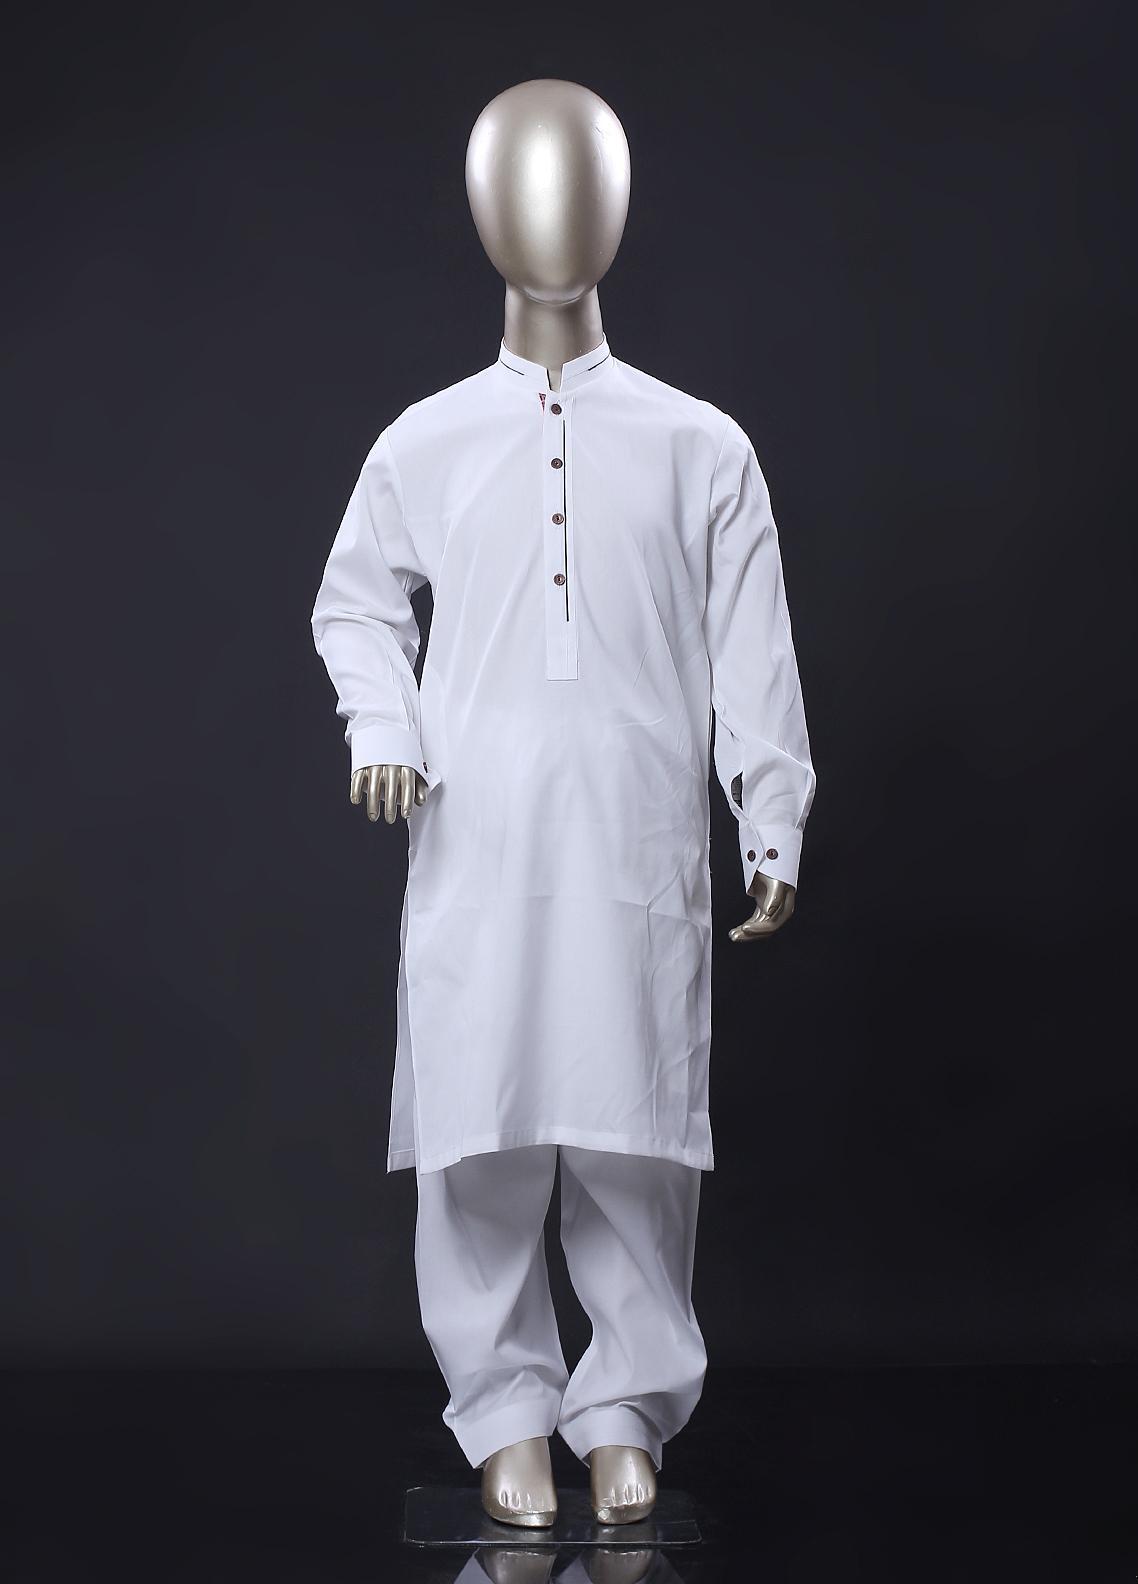 Aizaz Zafar Cotton Formal Kameez Shalwar for Boys -  258 White